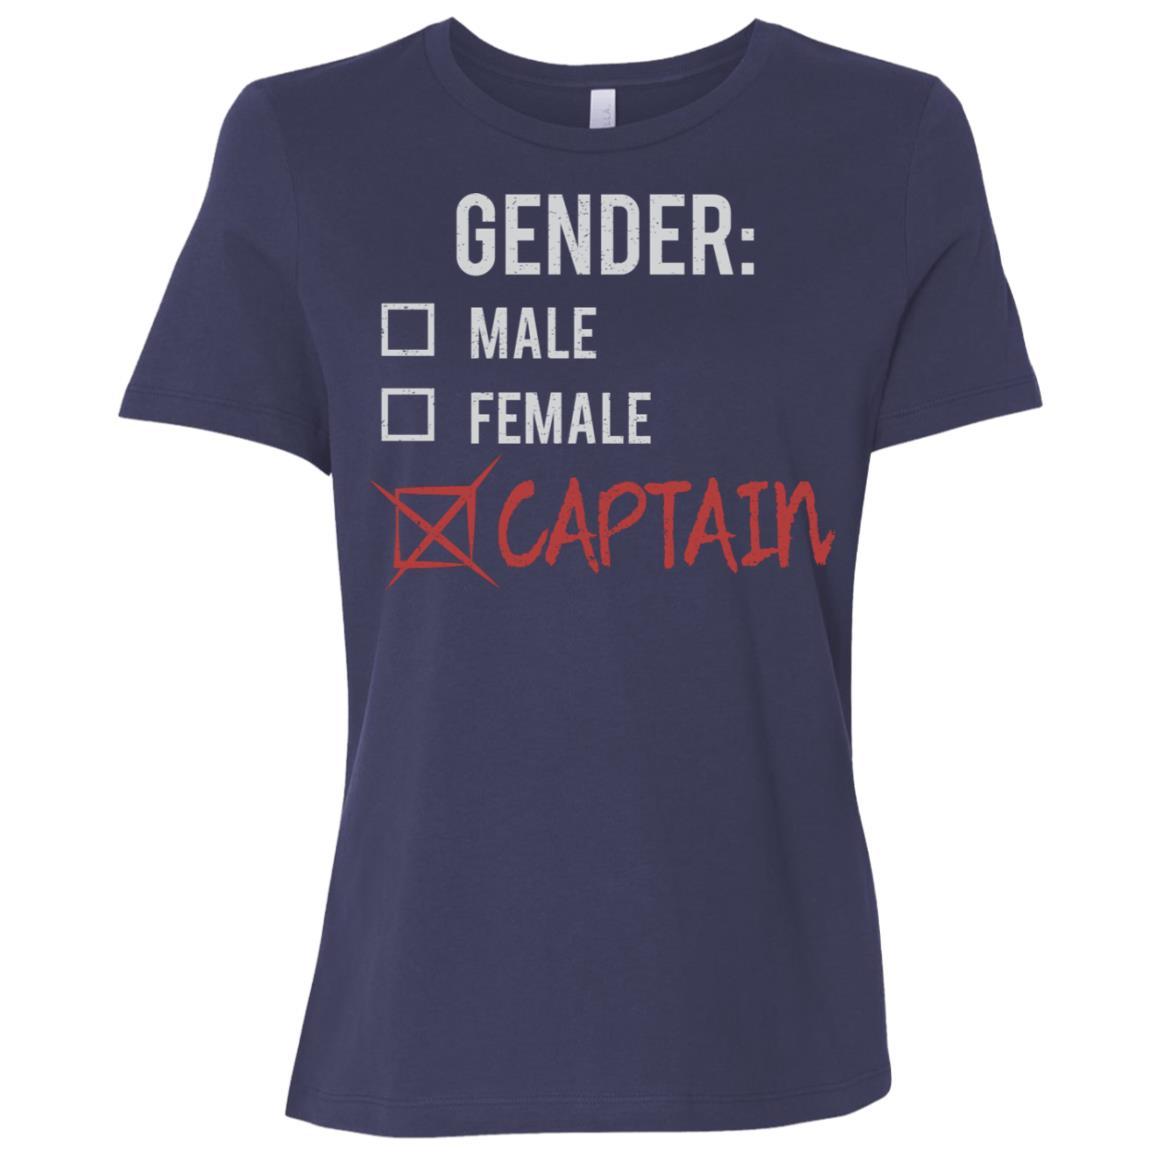 Male Female Captain Gender Nonbinary Trans Women Short Sleeve T-Shirt